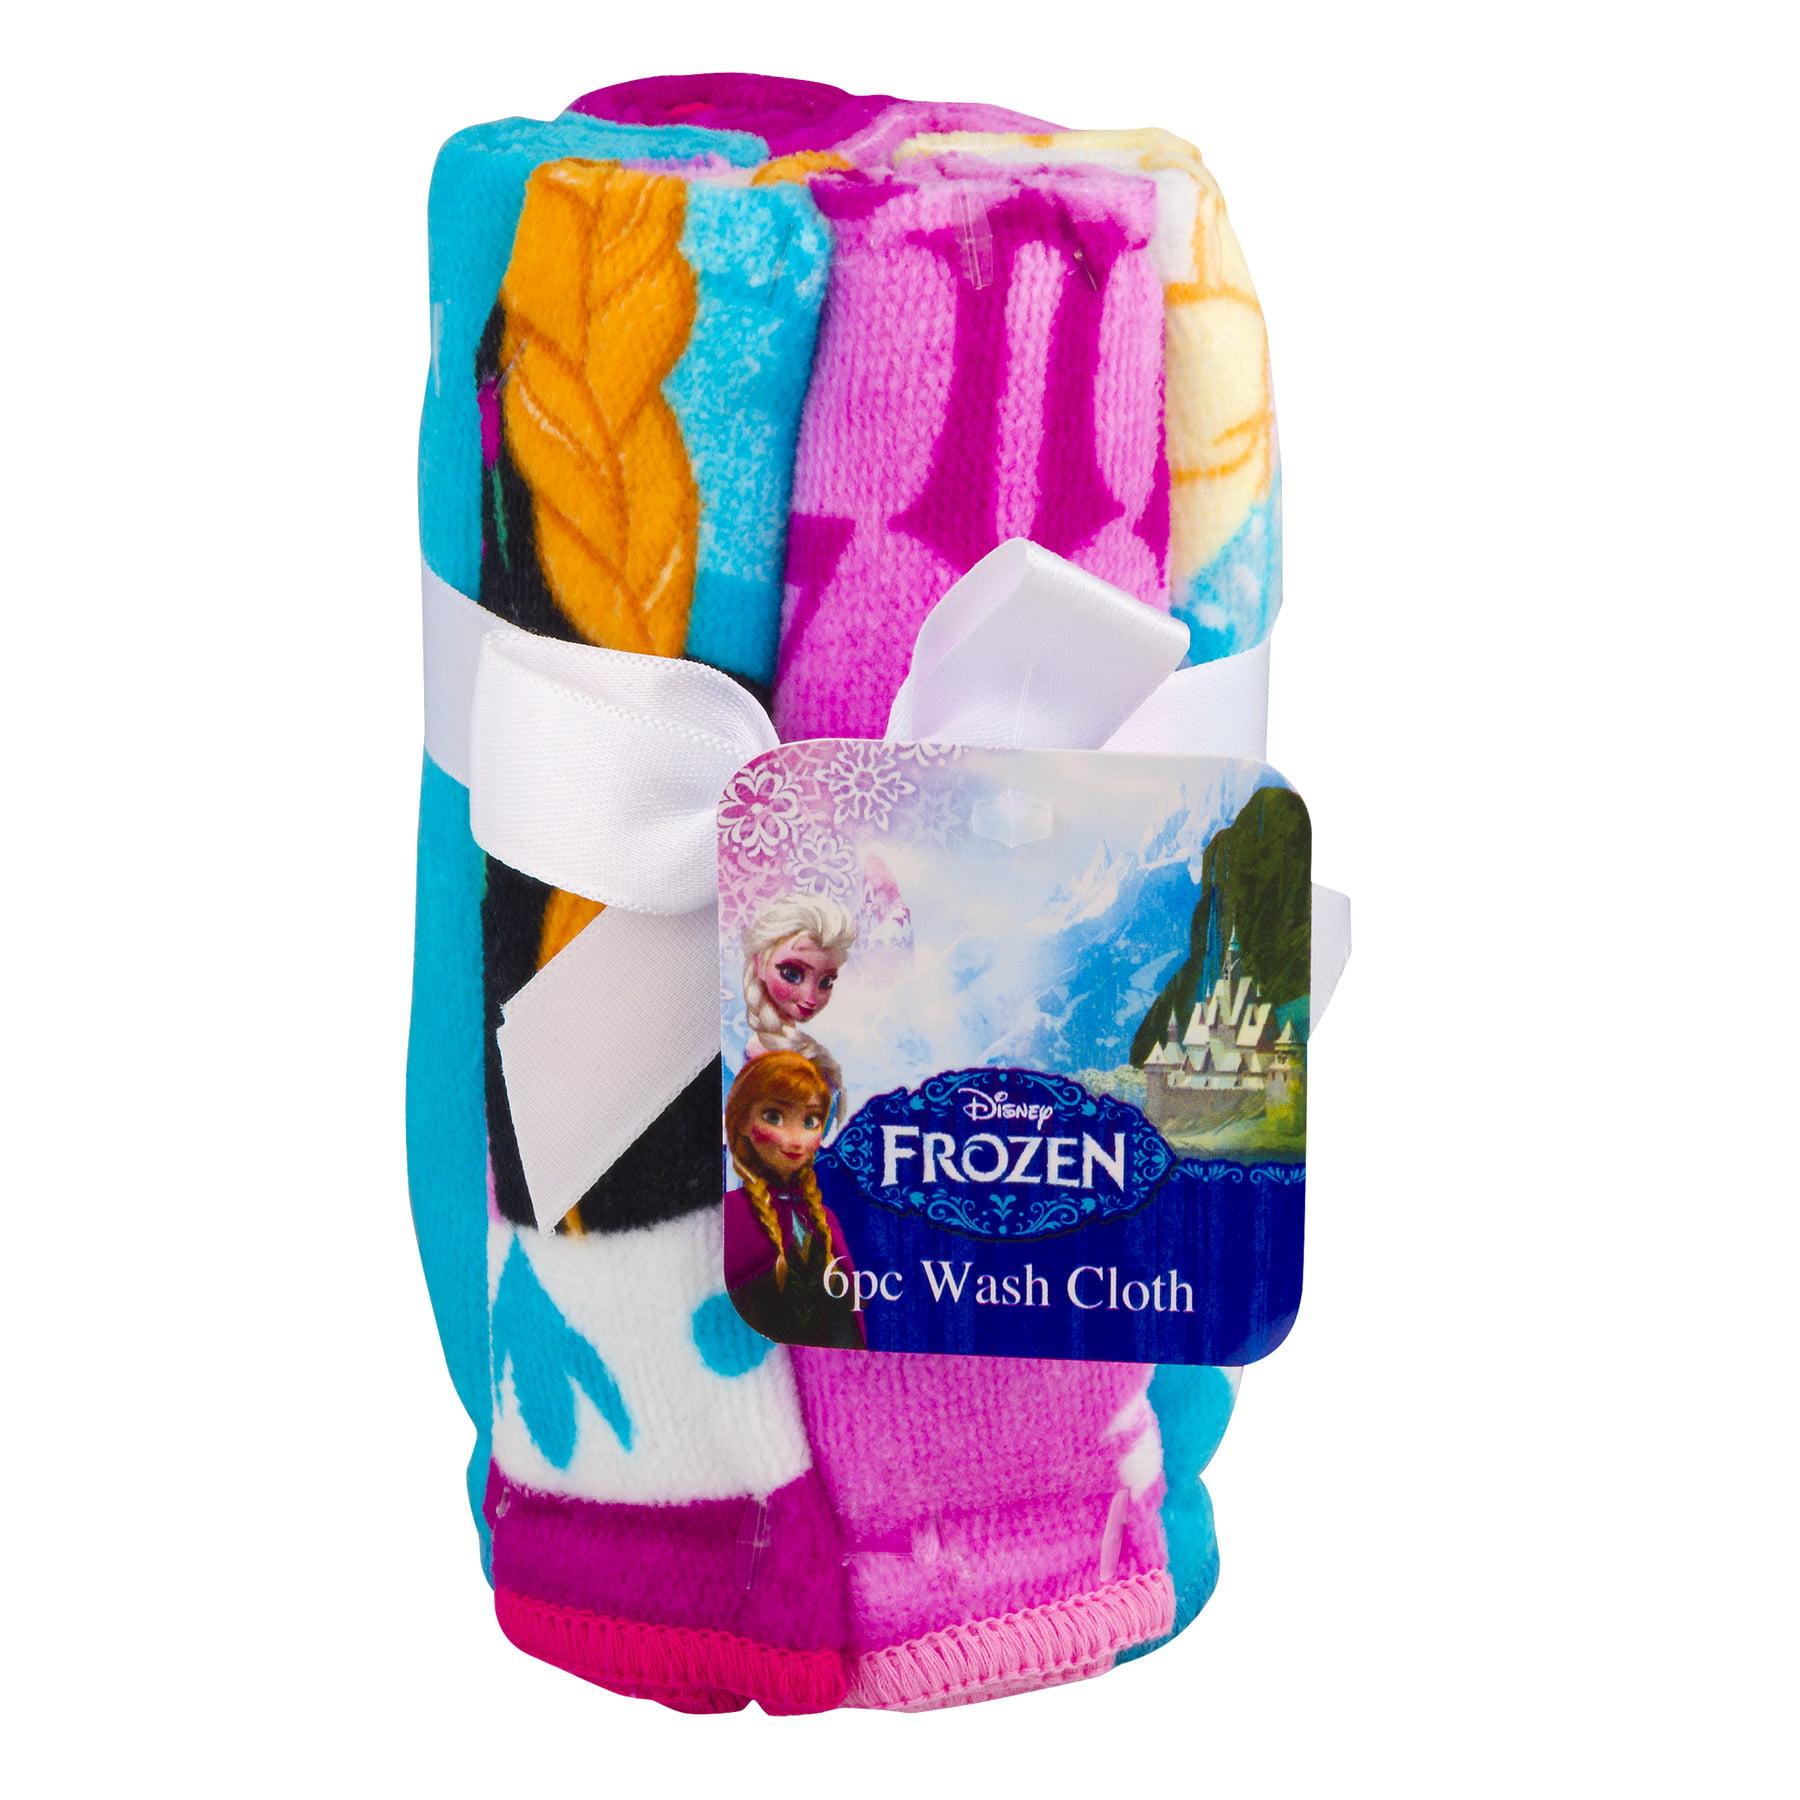 Disney Frozen Wash Cloth - 6 PC, 6.0 PIECE(S)